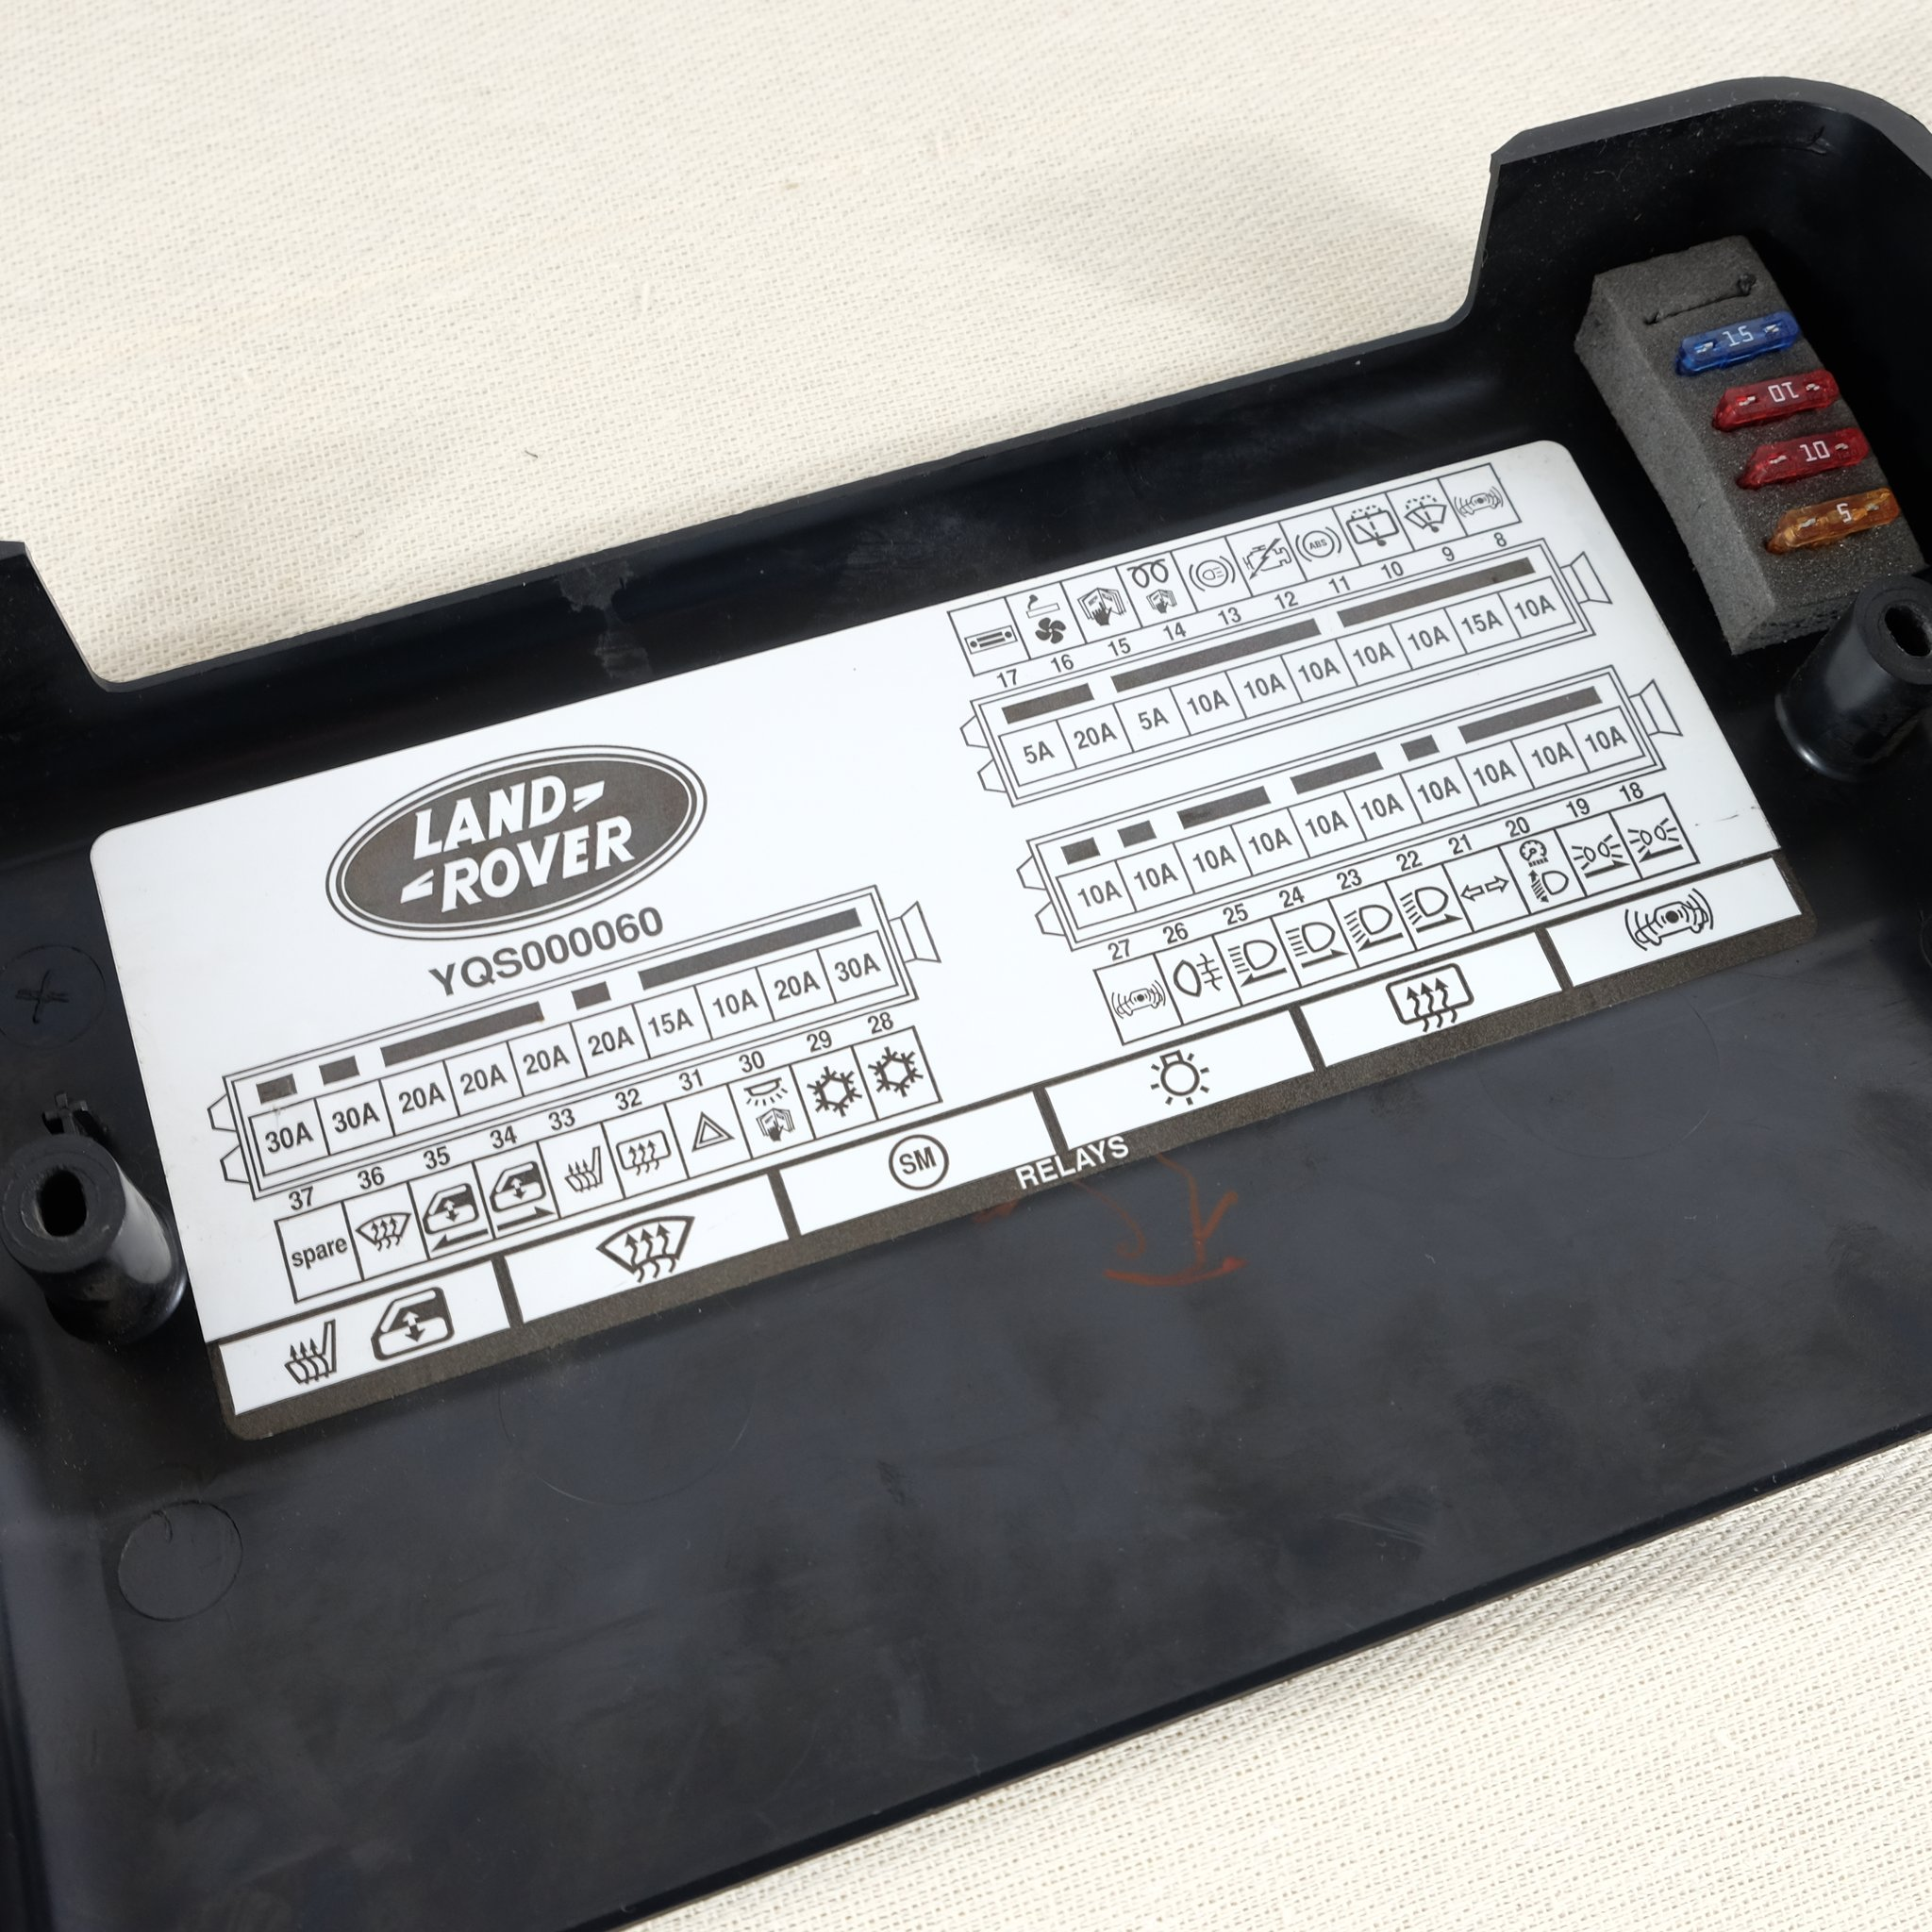 Land Rover Td40 Fuse Box   meet registre Wiring Diagram   meet ...